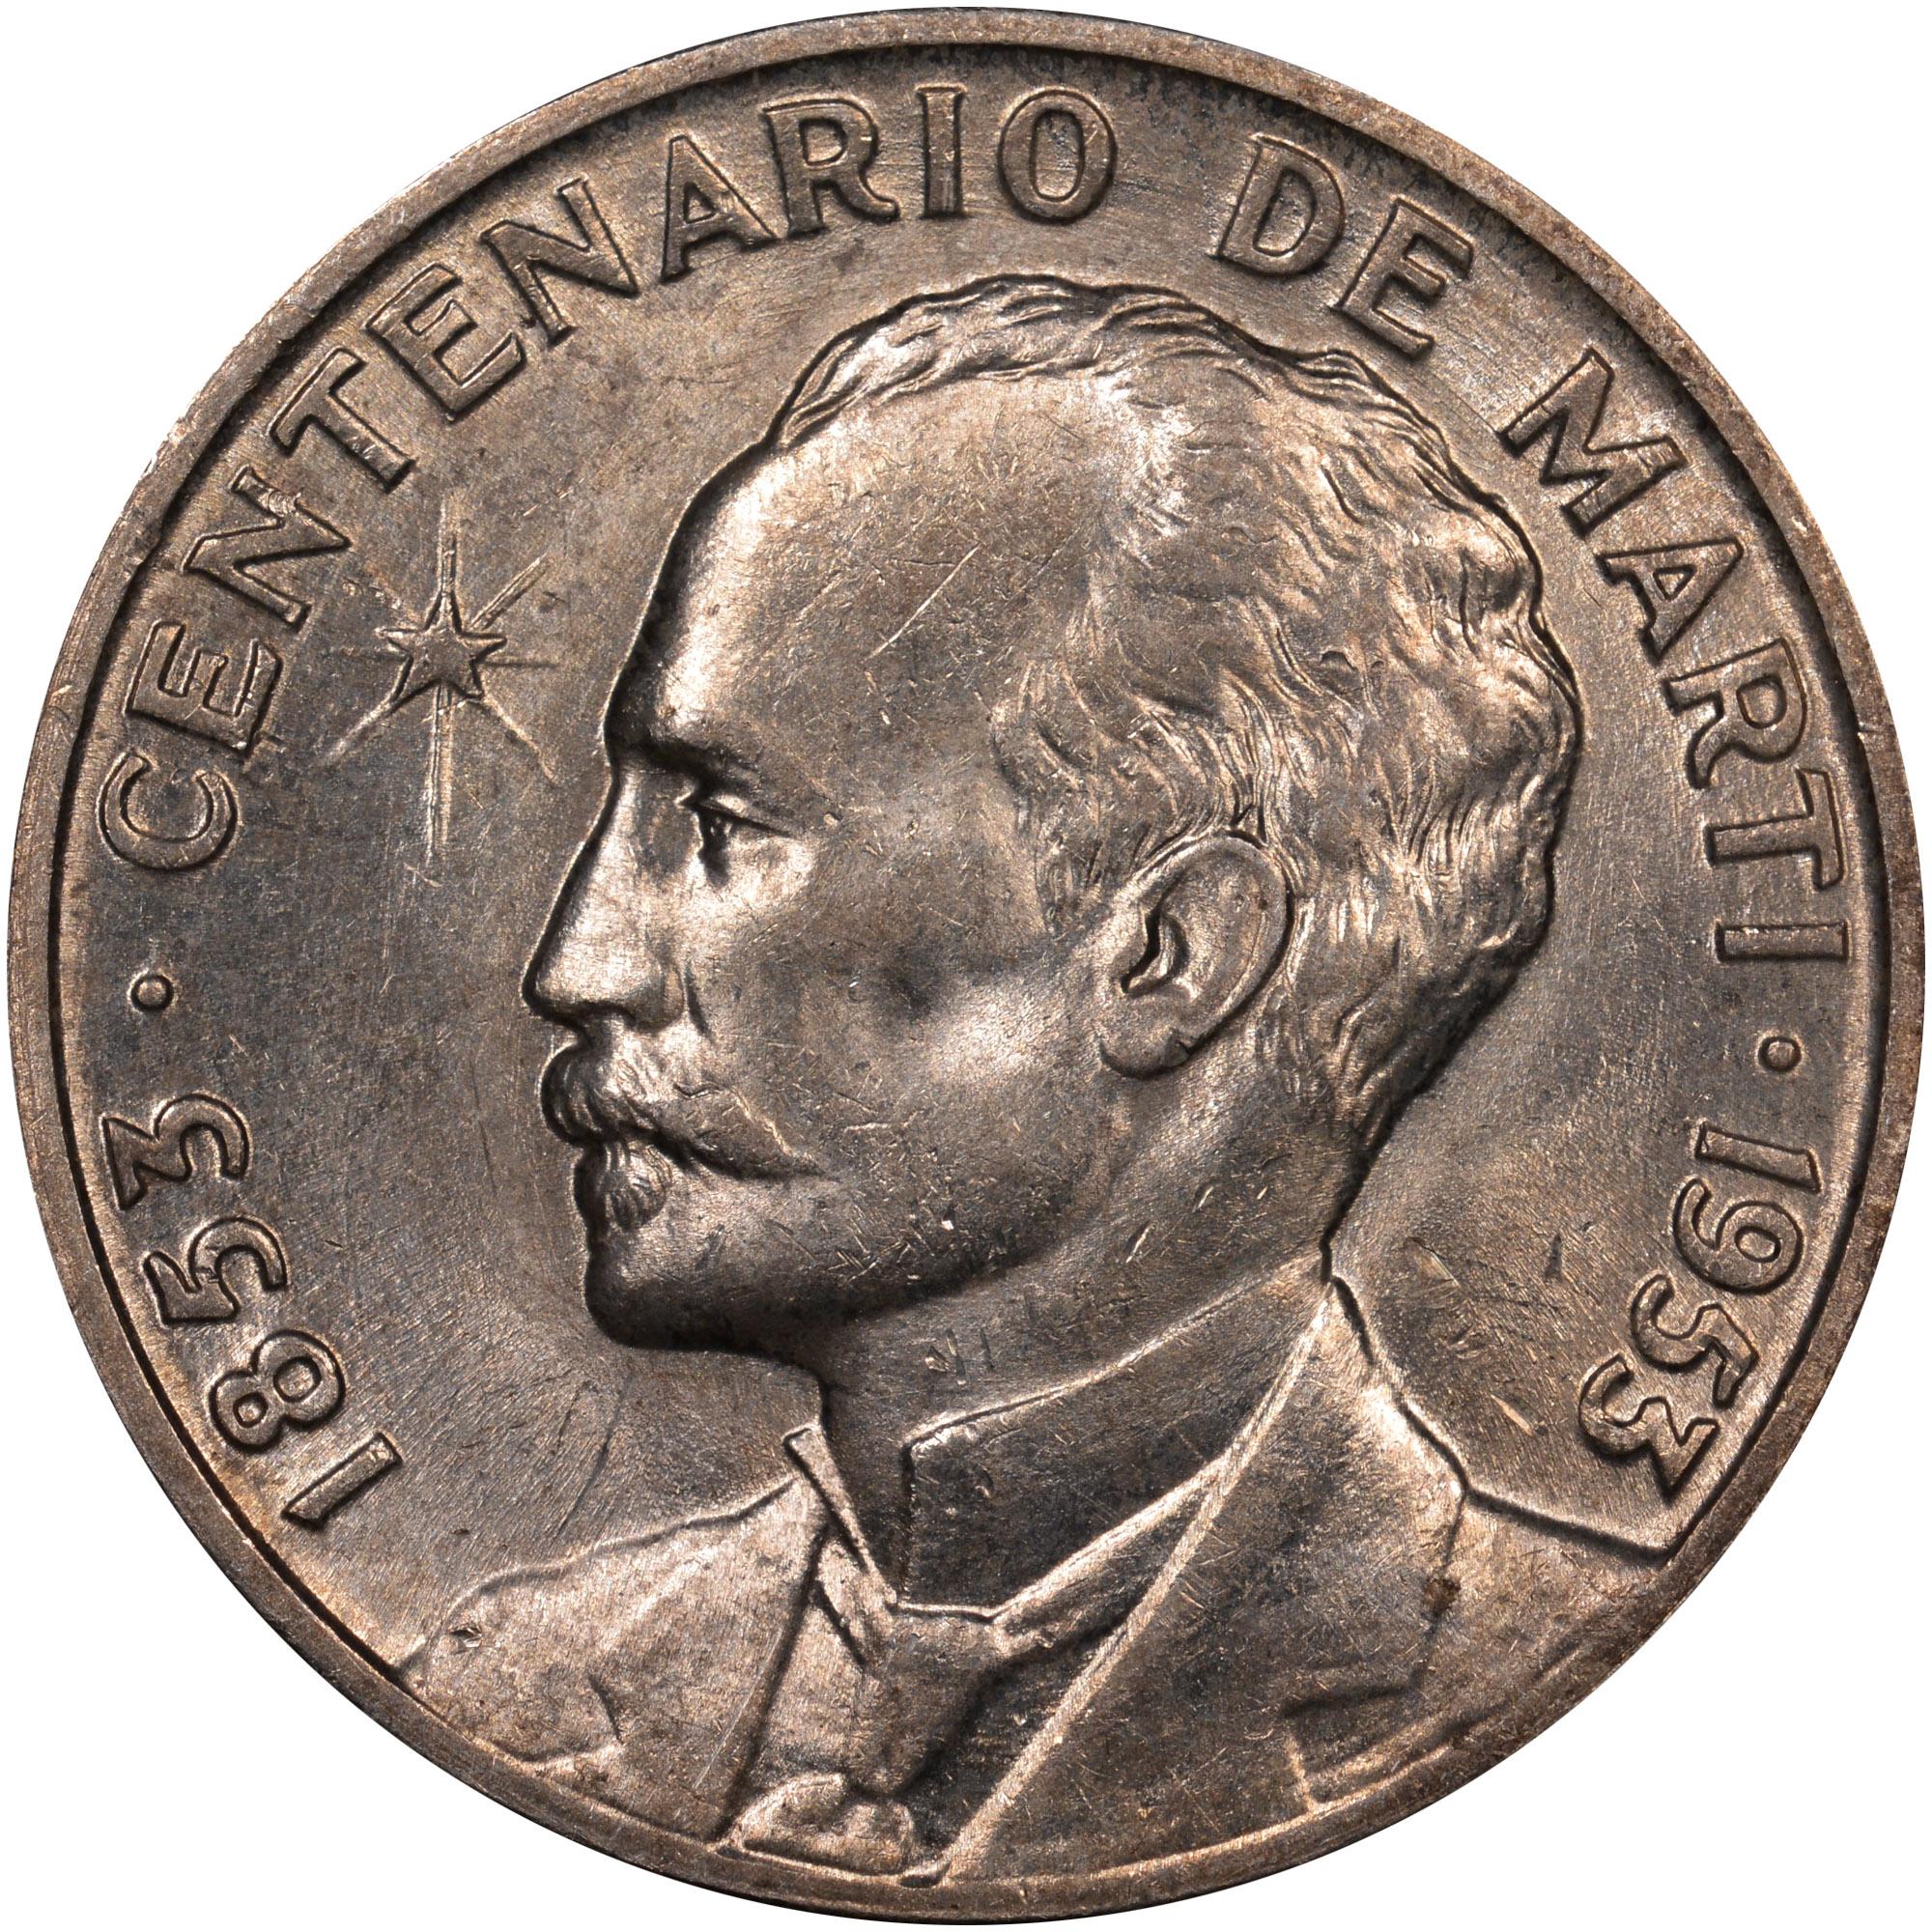 1953 Cuba 25 Centavos reverse